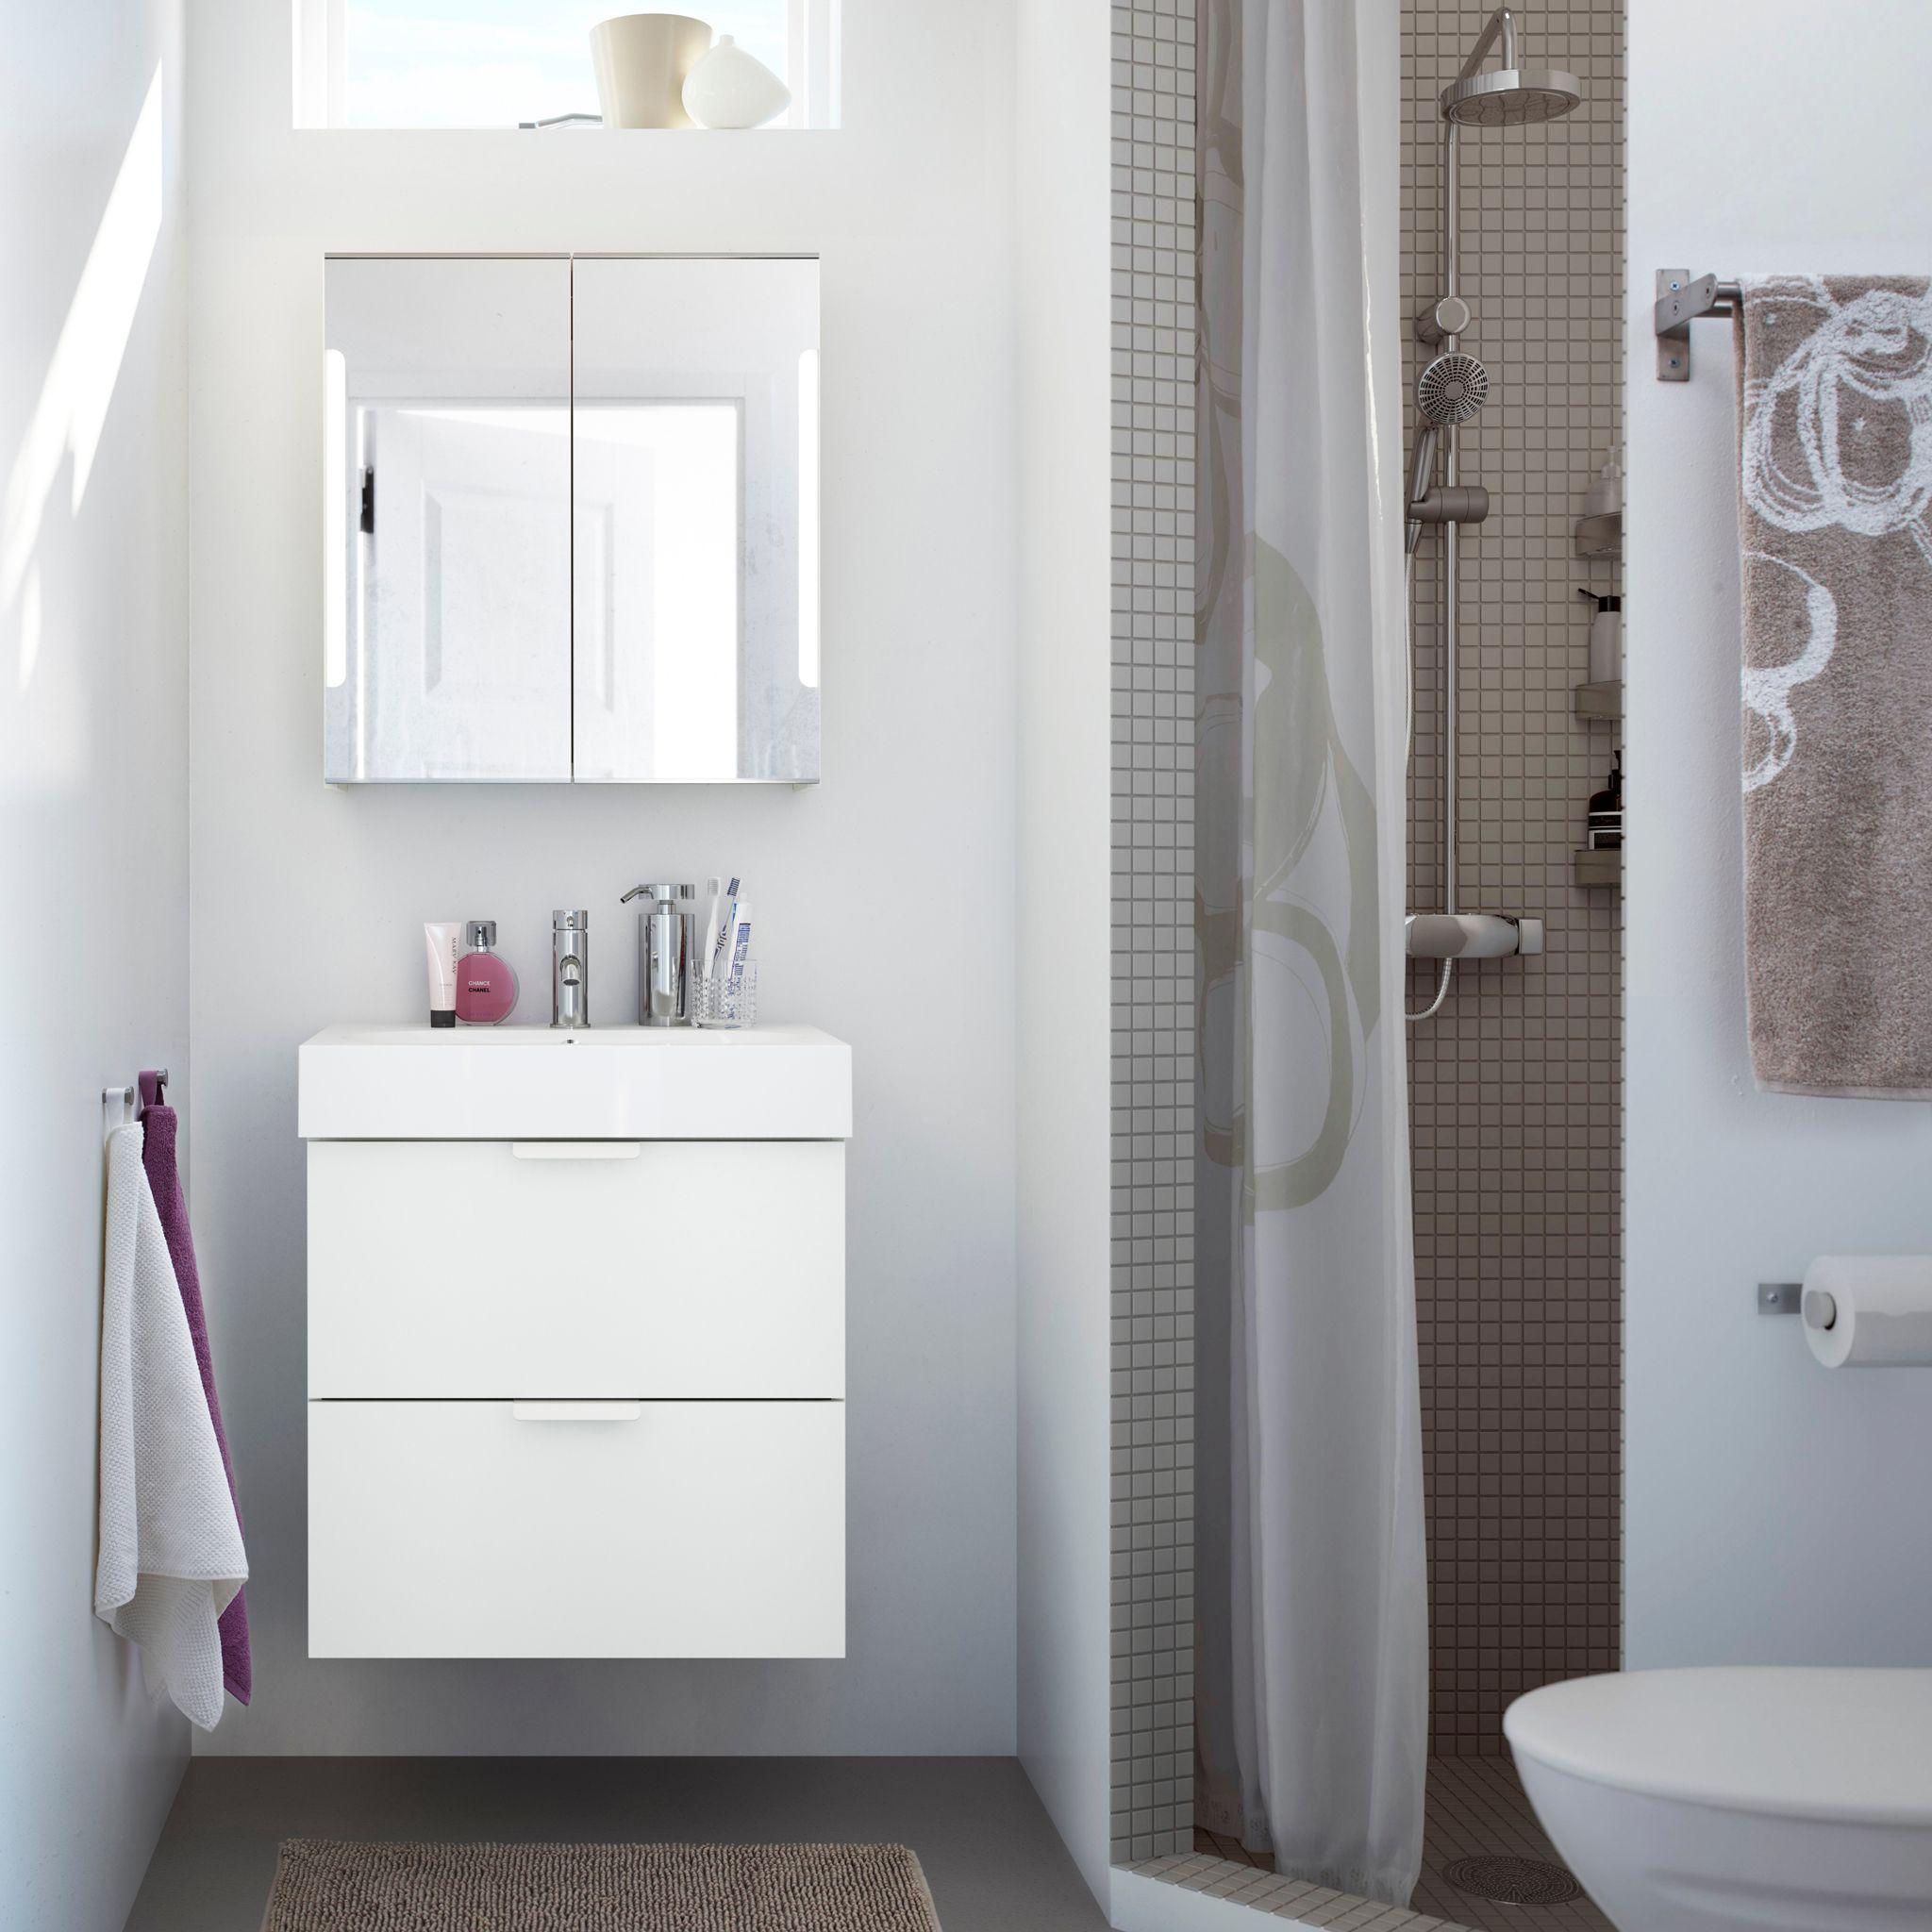 Related image  Bathroom decor, Small farmhouse bathroom, Small